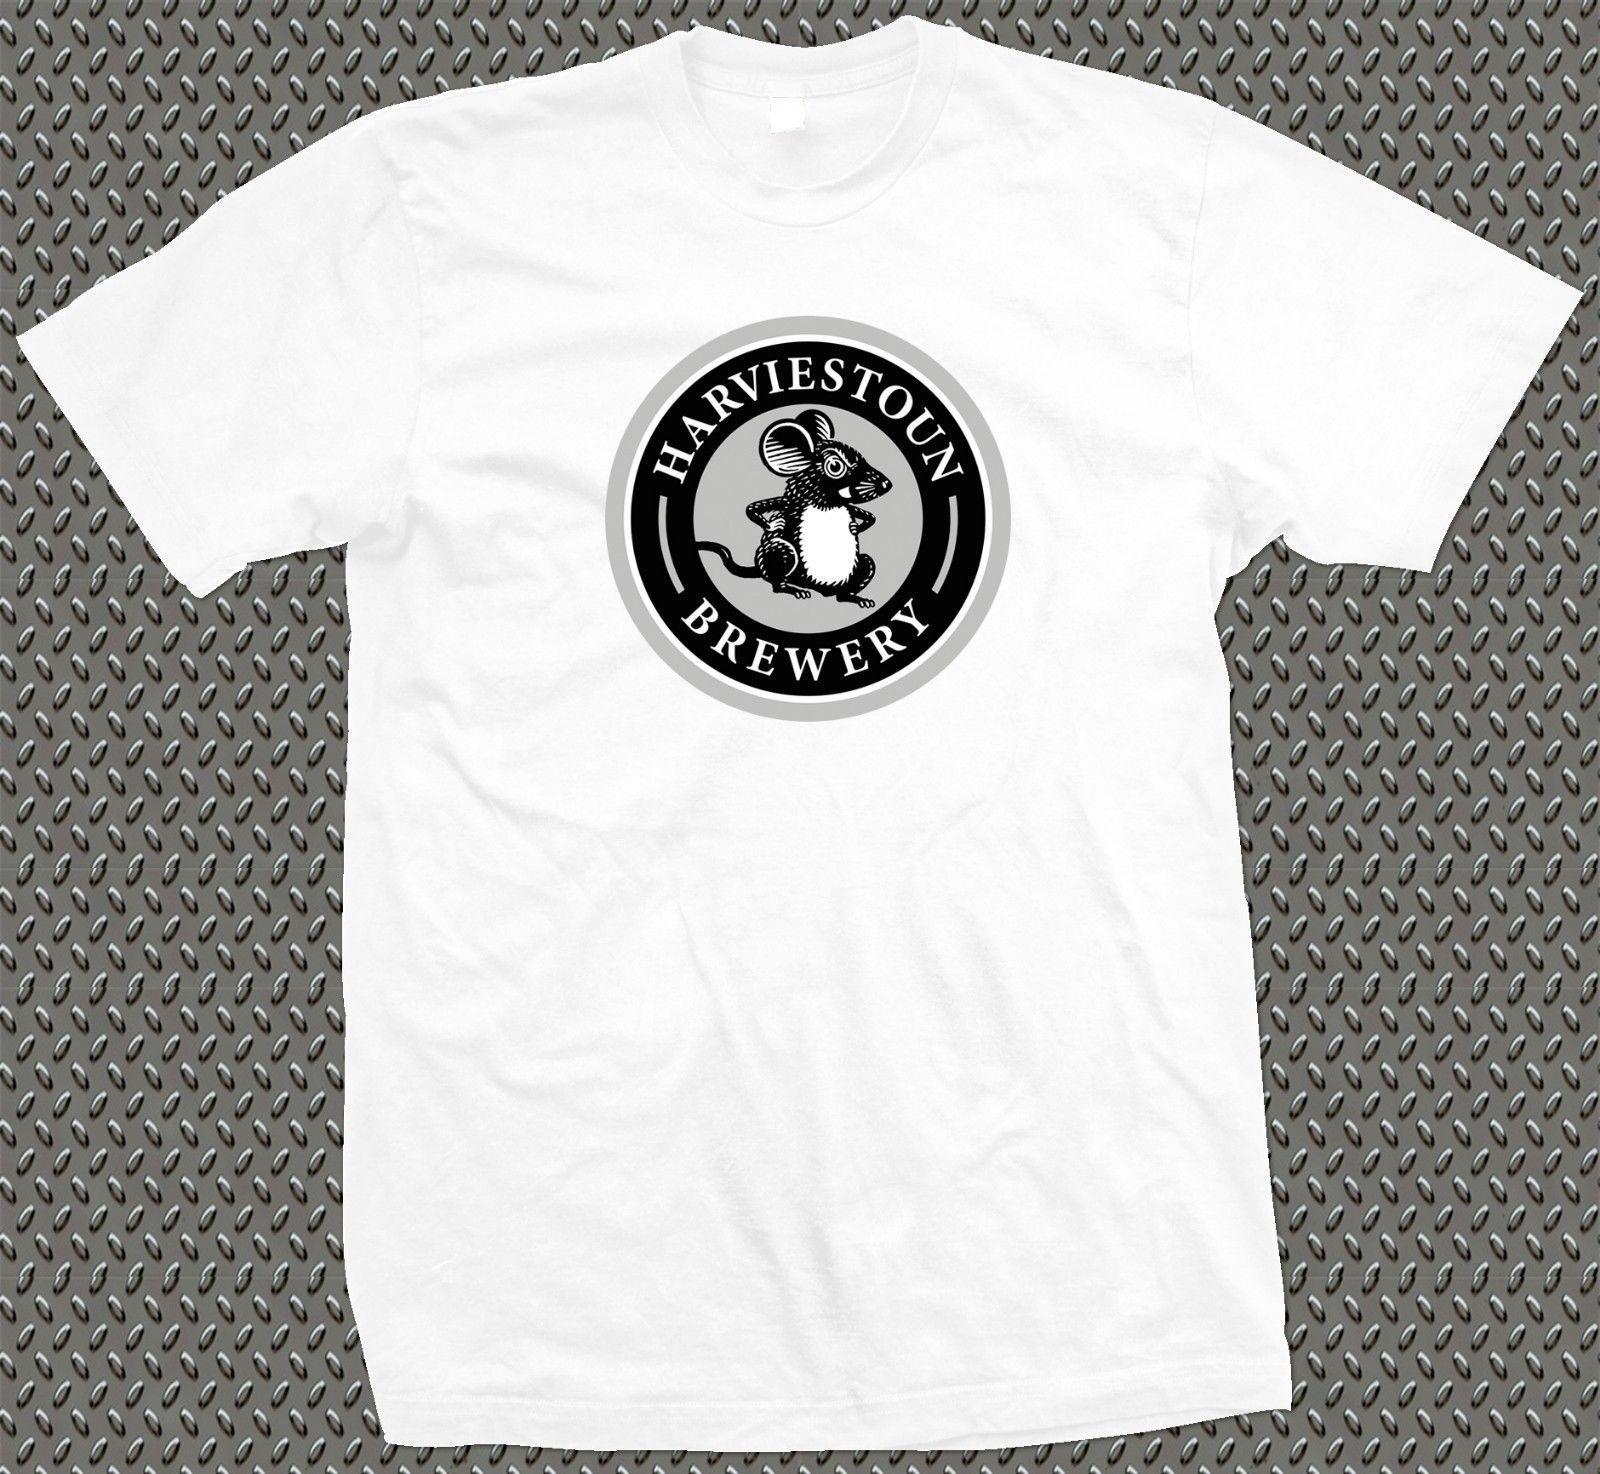 Harviestoun Printed T Shirt Cool Casual Pride T Shirt Men Unisex New  Fashion Tshirt Loose Size Top Ajax 2018 Funny T Shirts Tee Shirt Online  Shopping 24 Hour Tee Shirts From Foyastore,